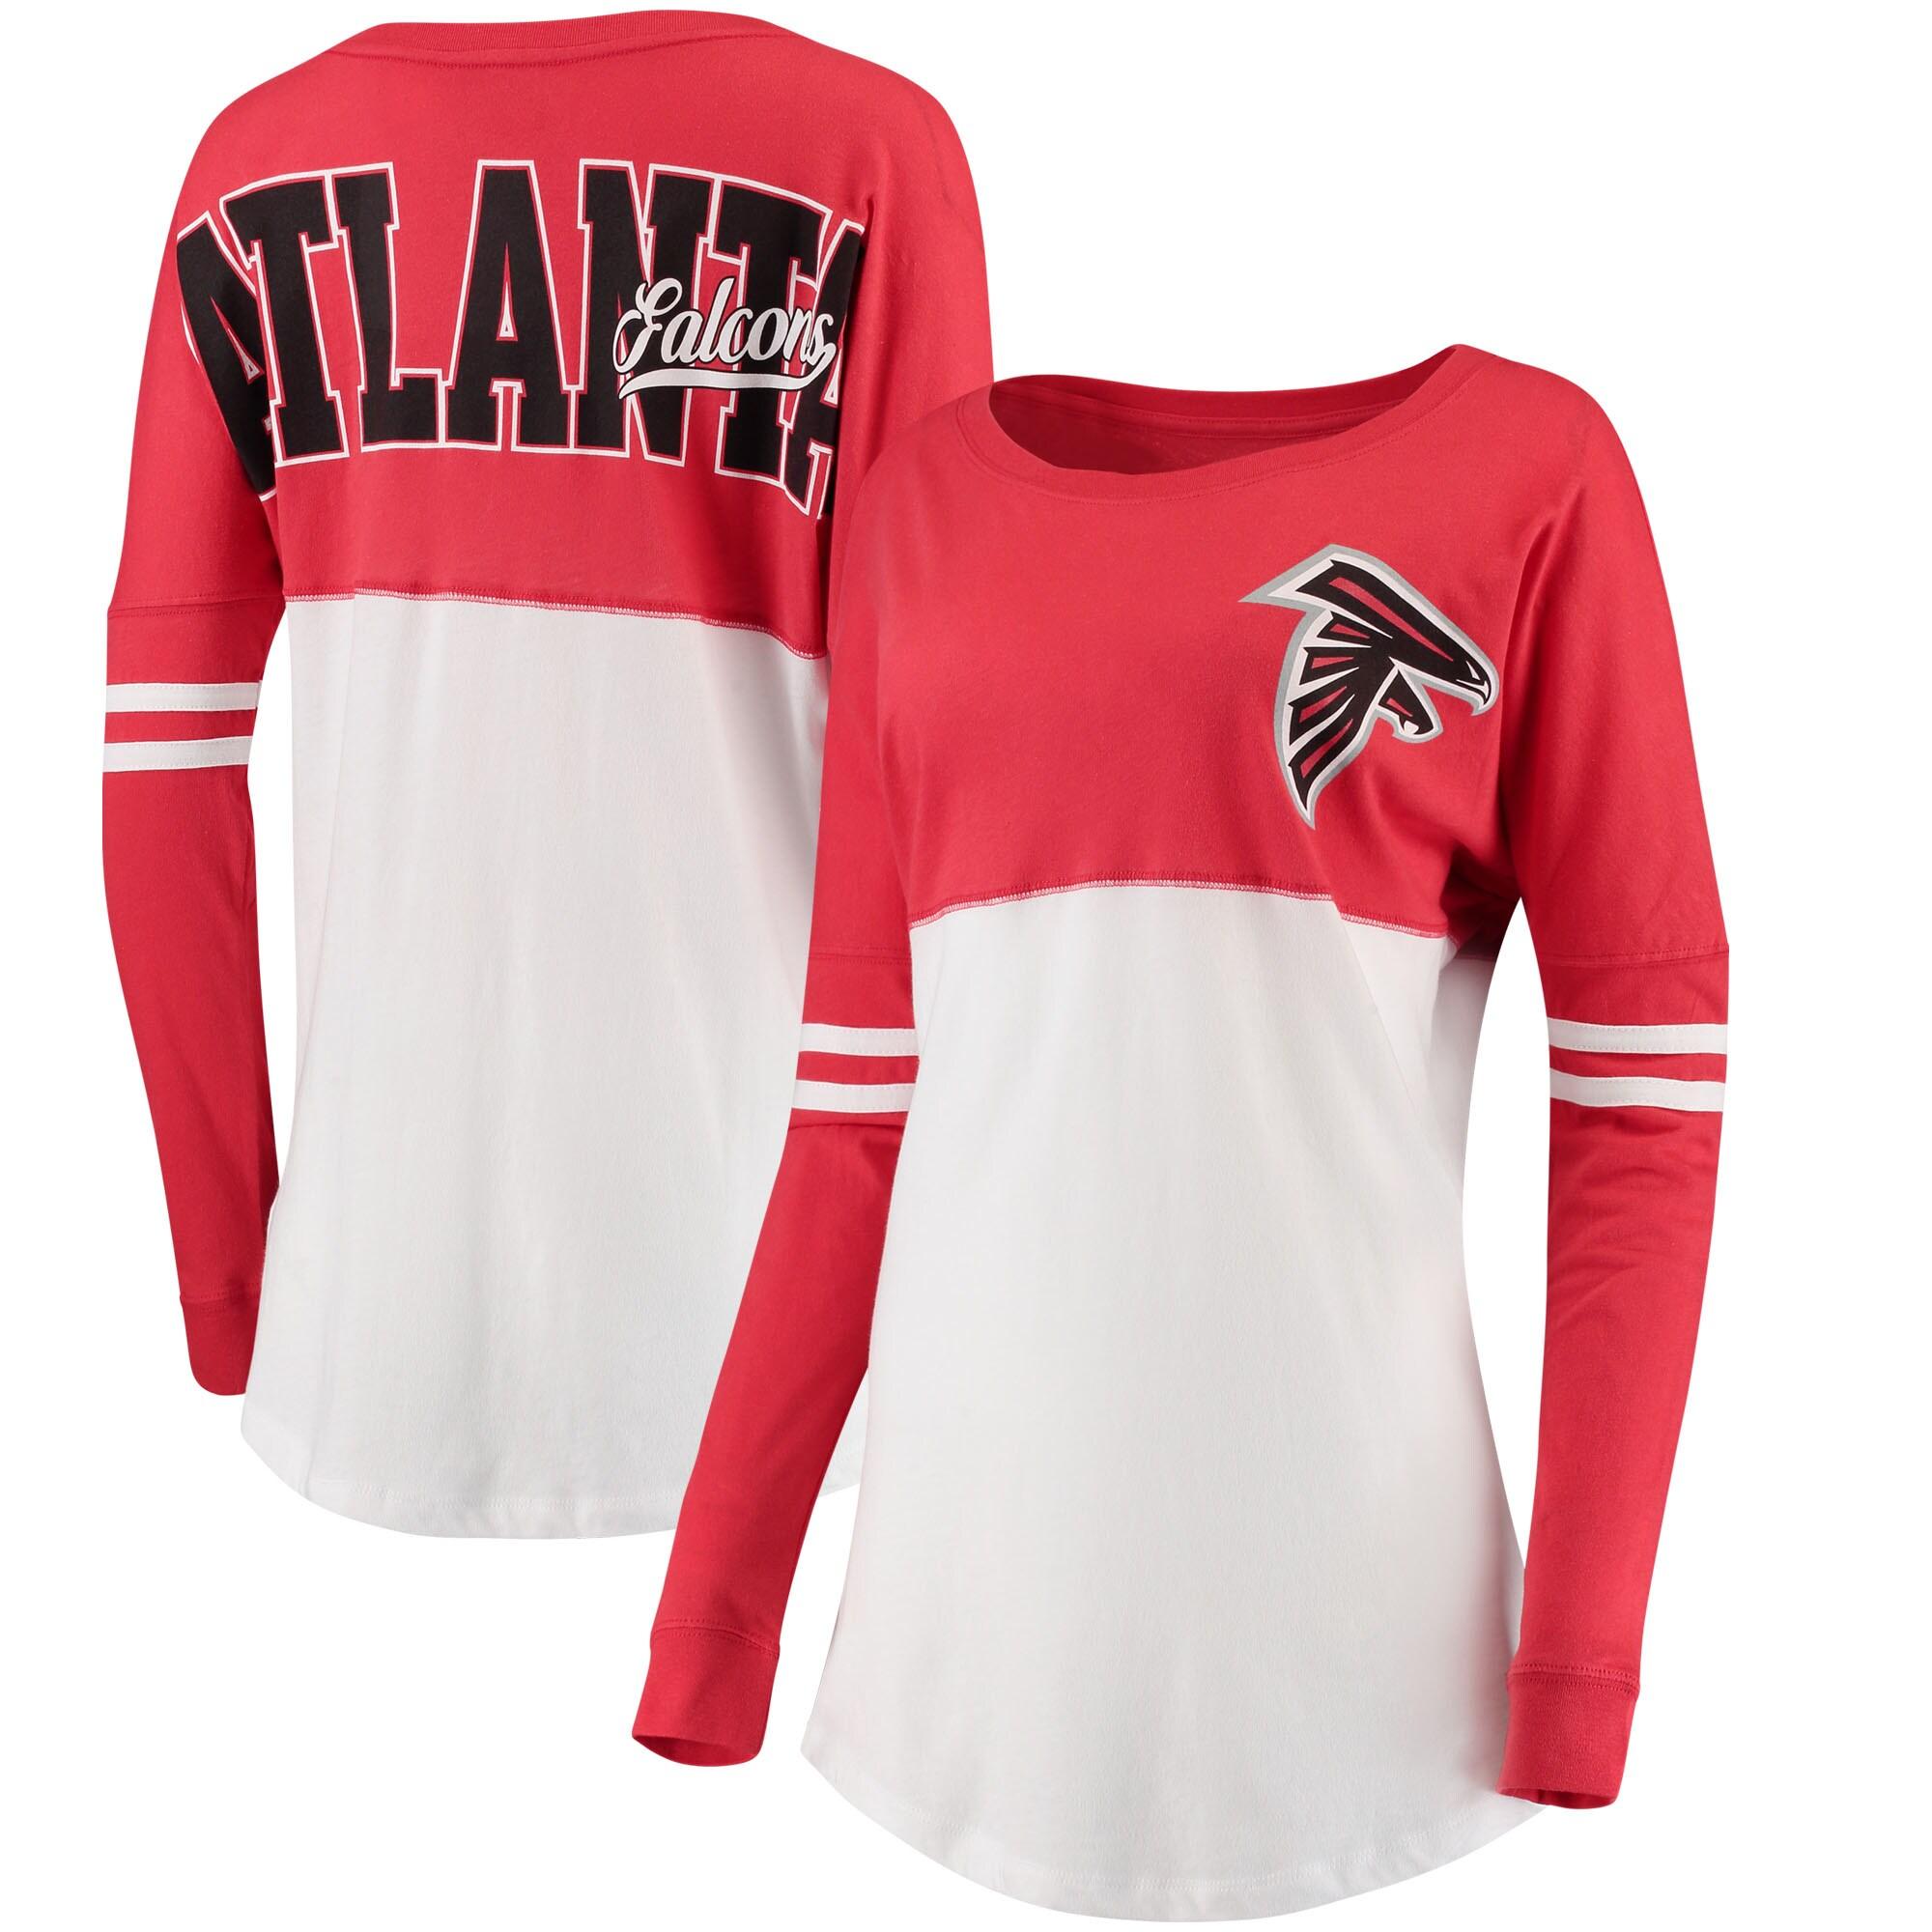 Atlanta Falcons 5th & Ocean by New Era Women's Team Logo Athletic Varsity Long Sleeve T-Shirt - Red/White